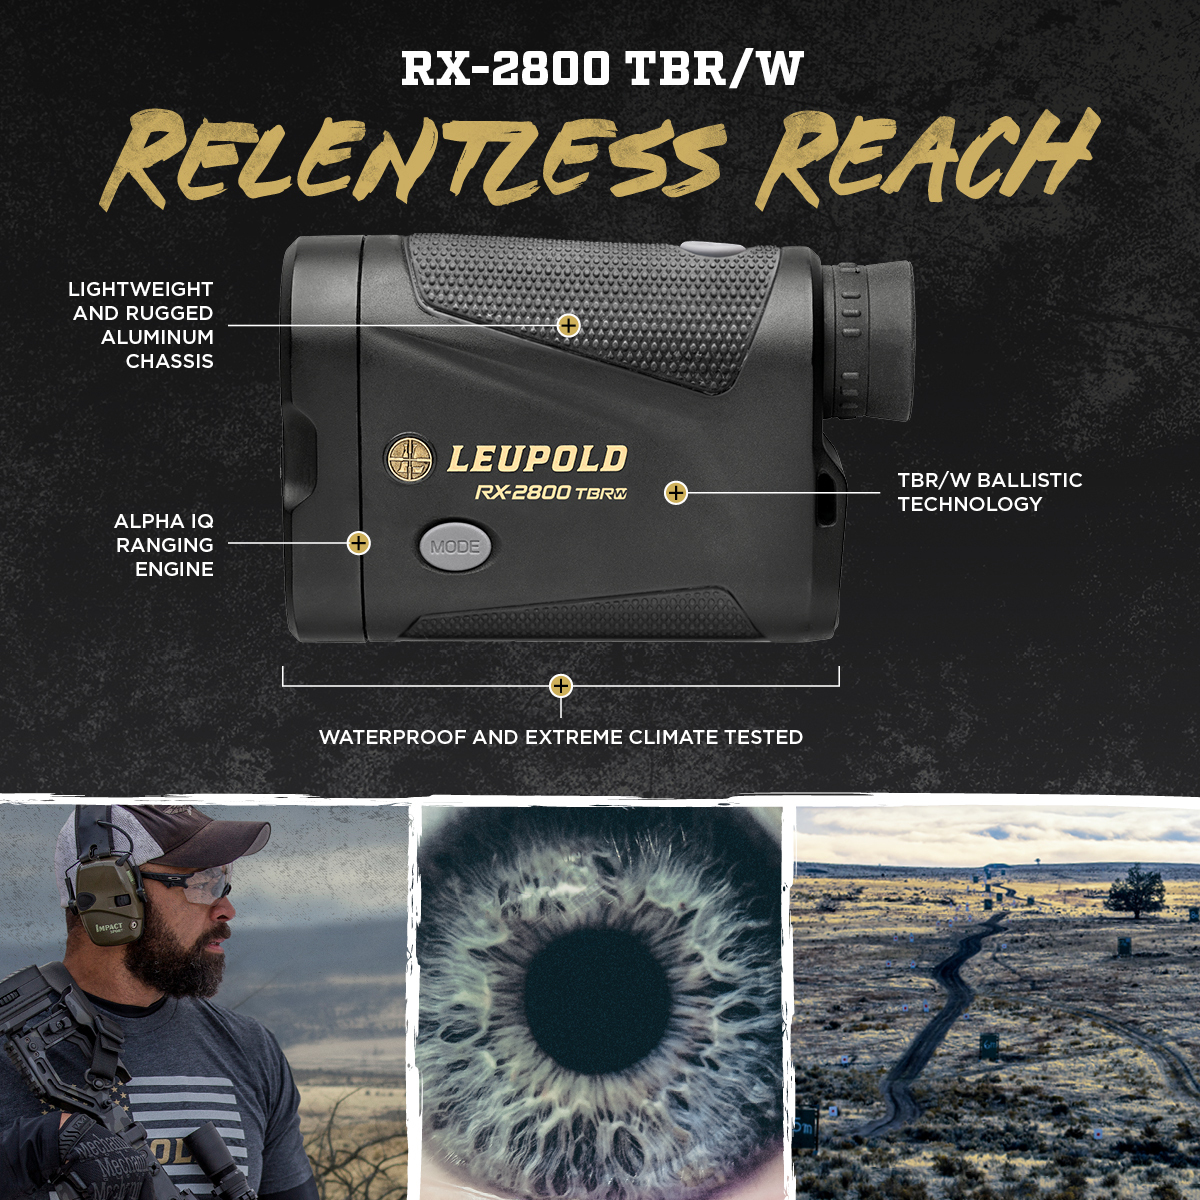 Relentless Reach: Introducing the RX-2800 TBR/W   Leupold